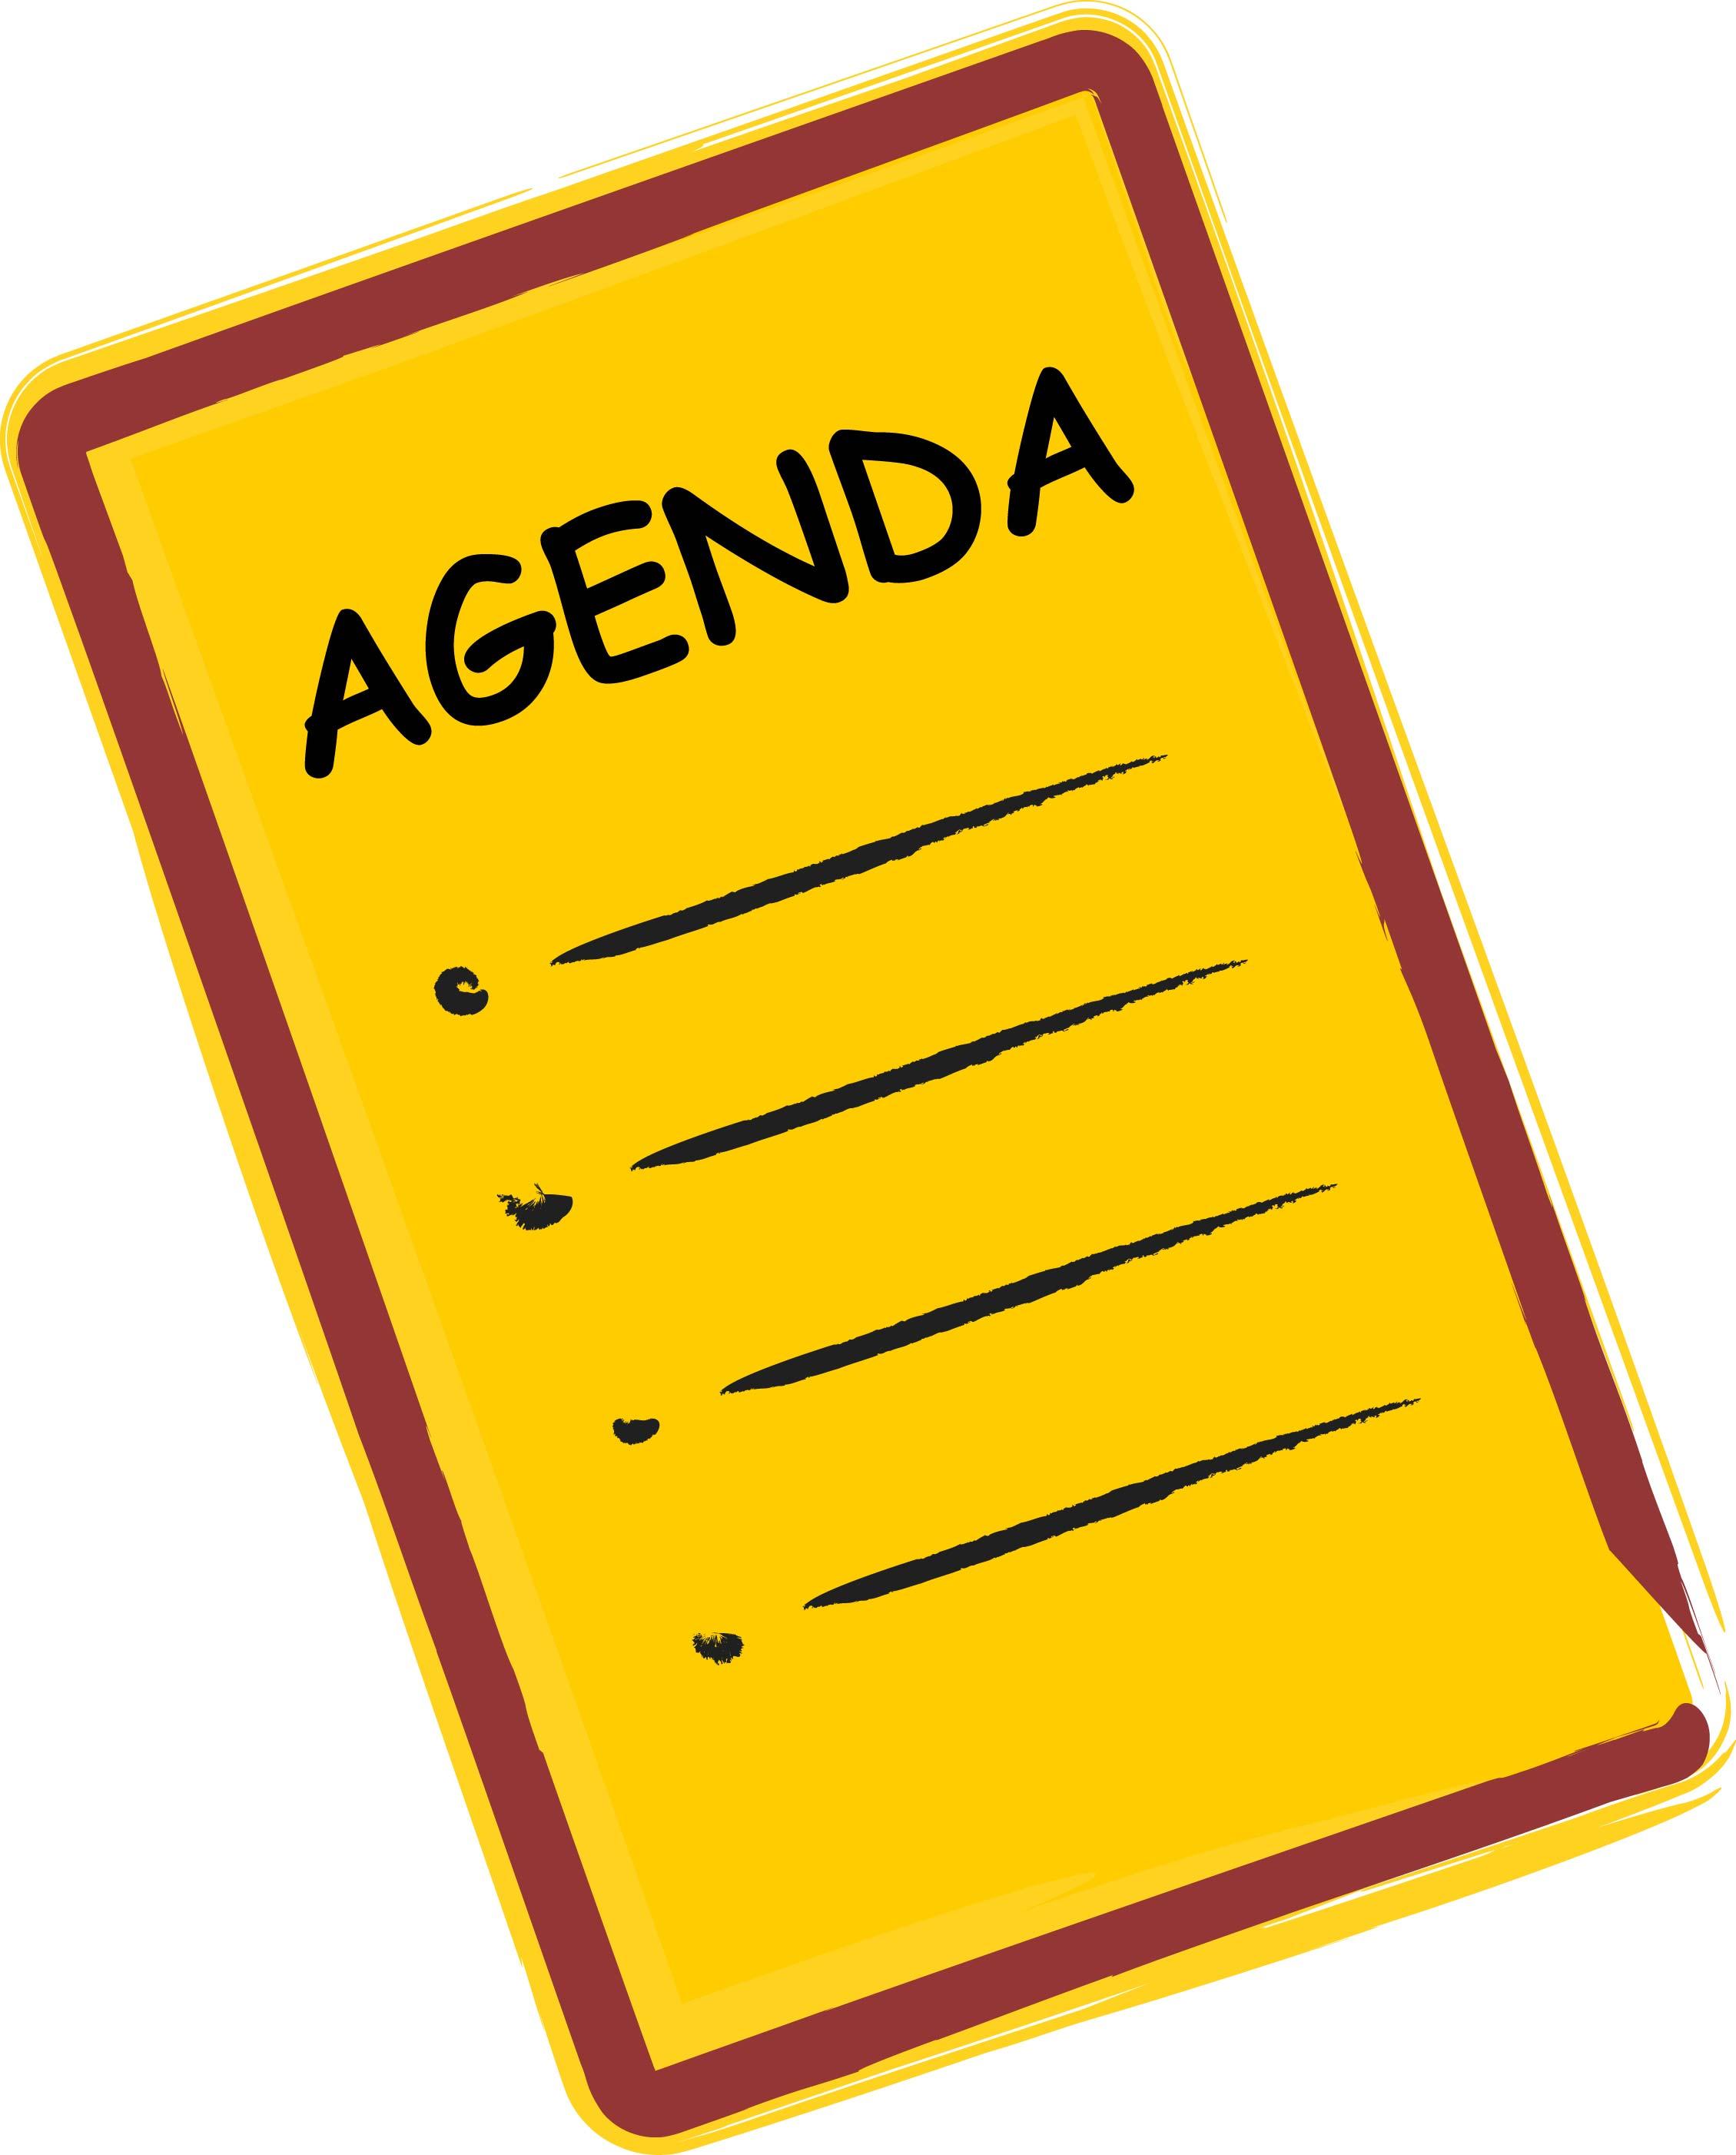 graphics-agenda-603334.jpg